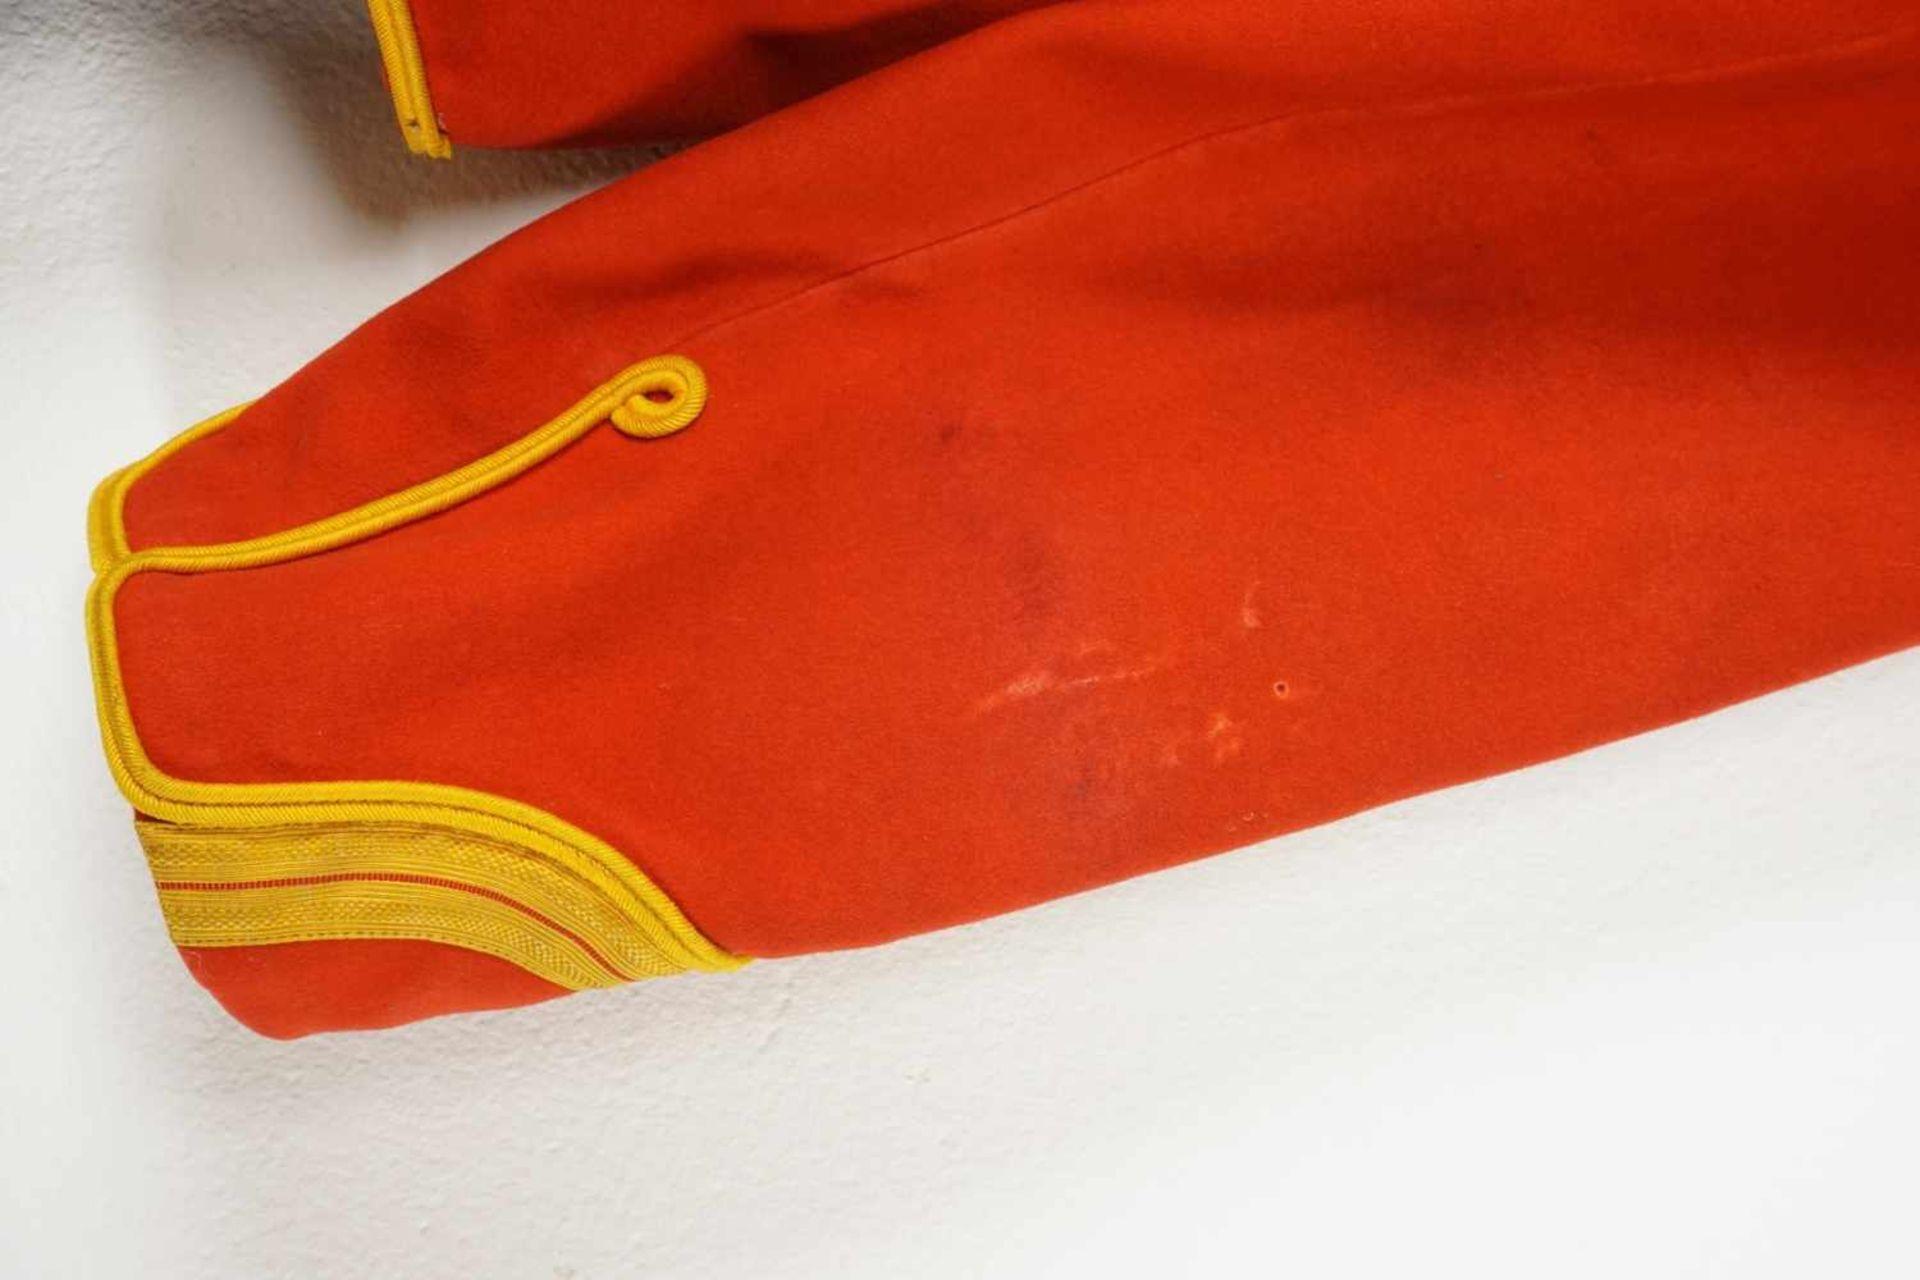 Uniform des Leib-Garde-Husaren-Regiments Potsdam, um 1900 - Bild 5 aus 9